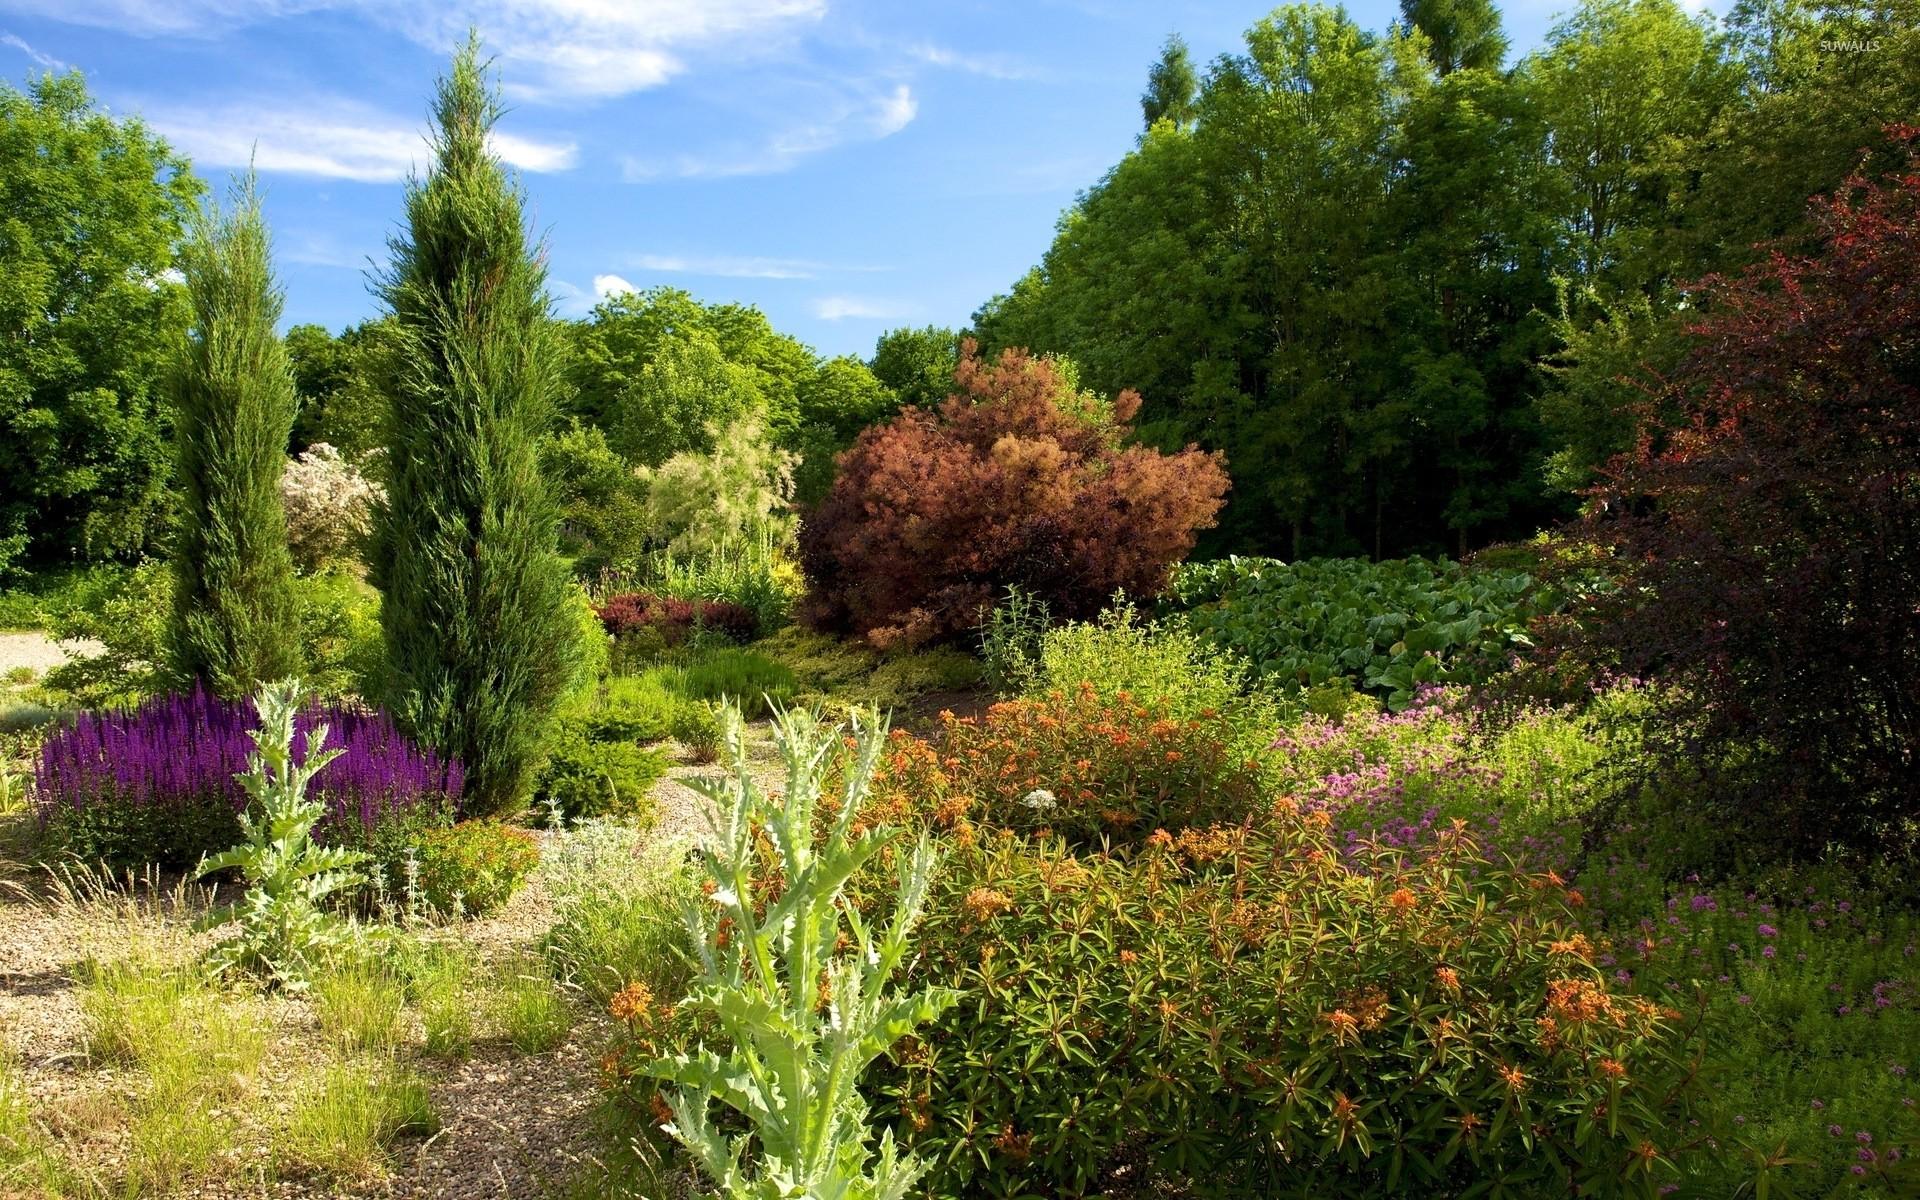 Heavenly garden on a sunny day wallpaper